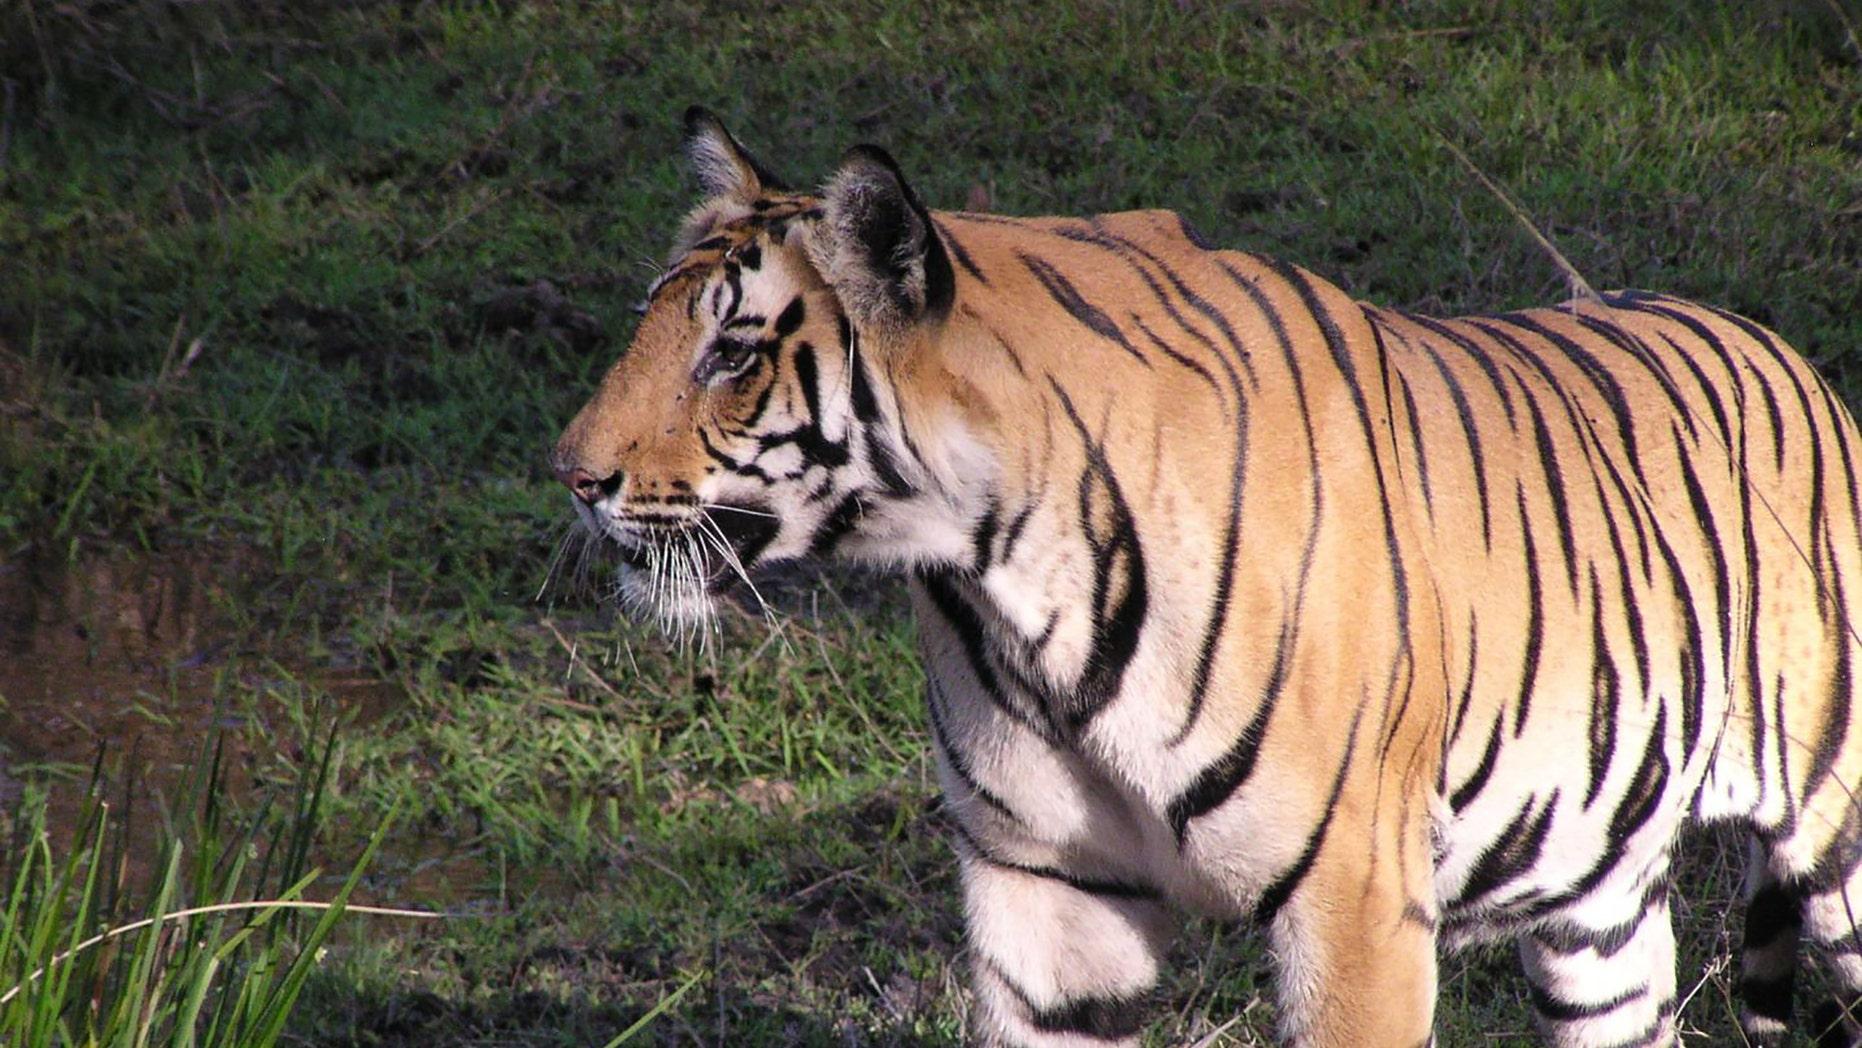 A tiger looking for boar in Bandhavgarh National Park in India. (Sue Palminteri)